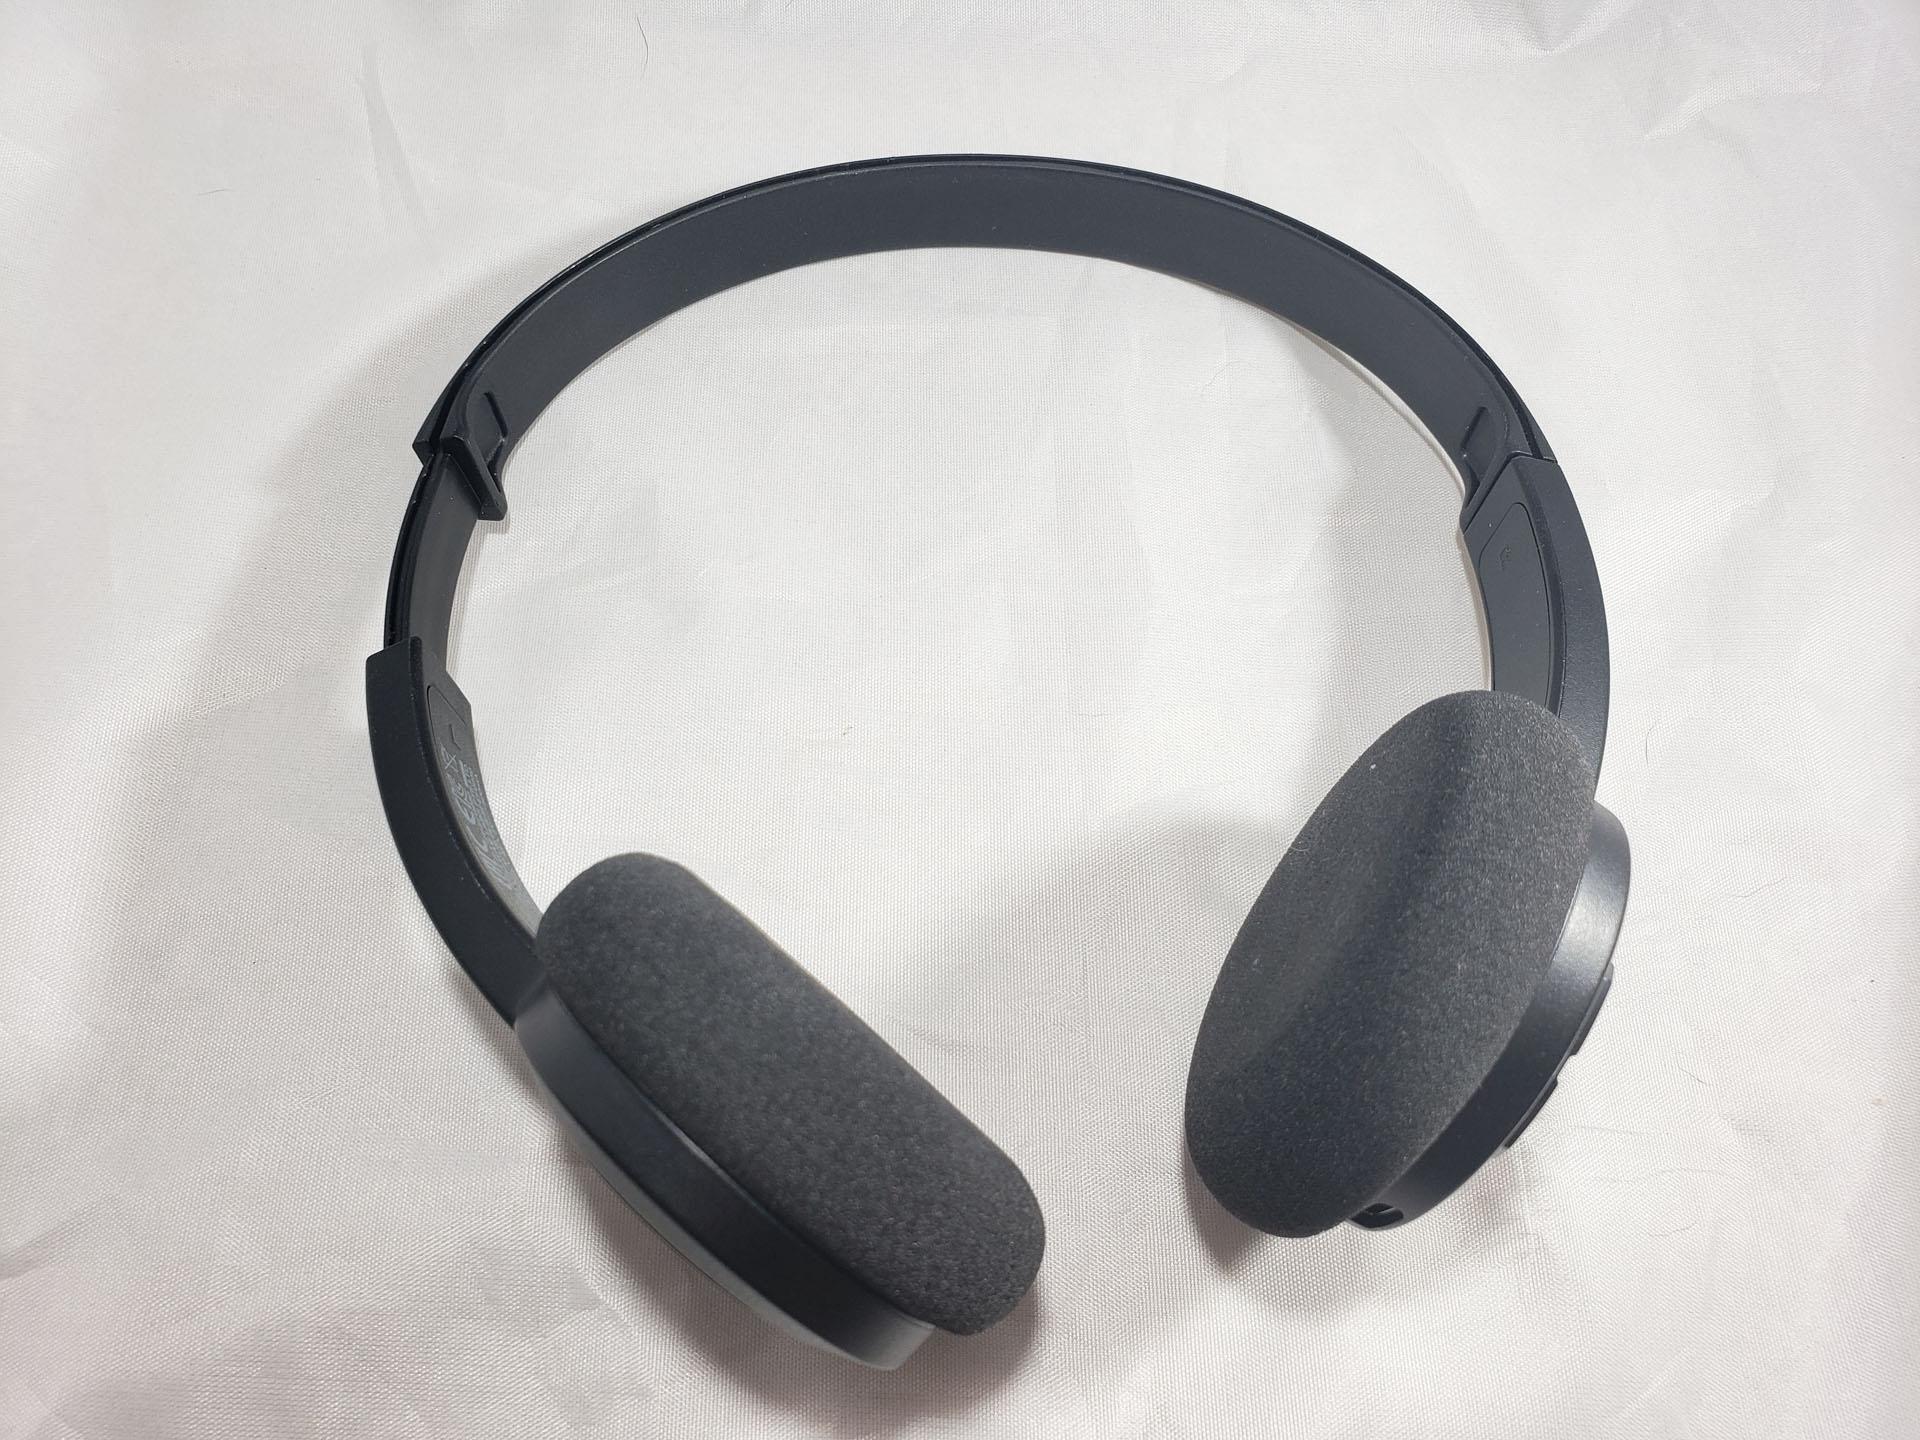 Creative Labs Sound Blaster JAM V2